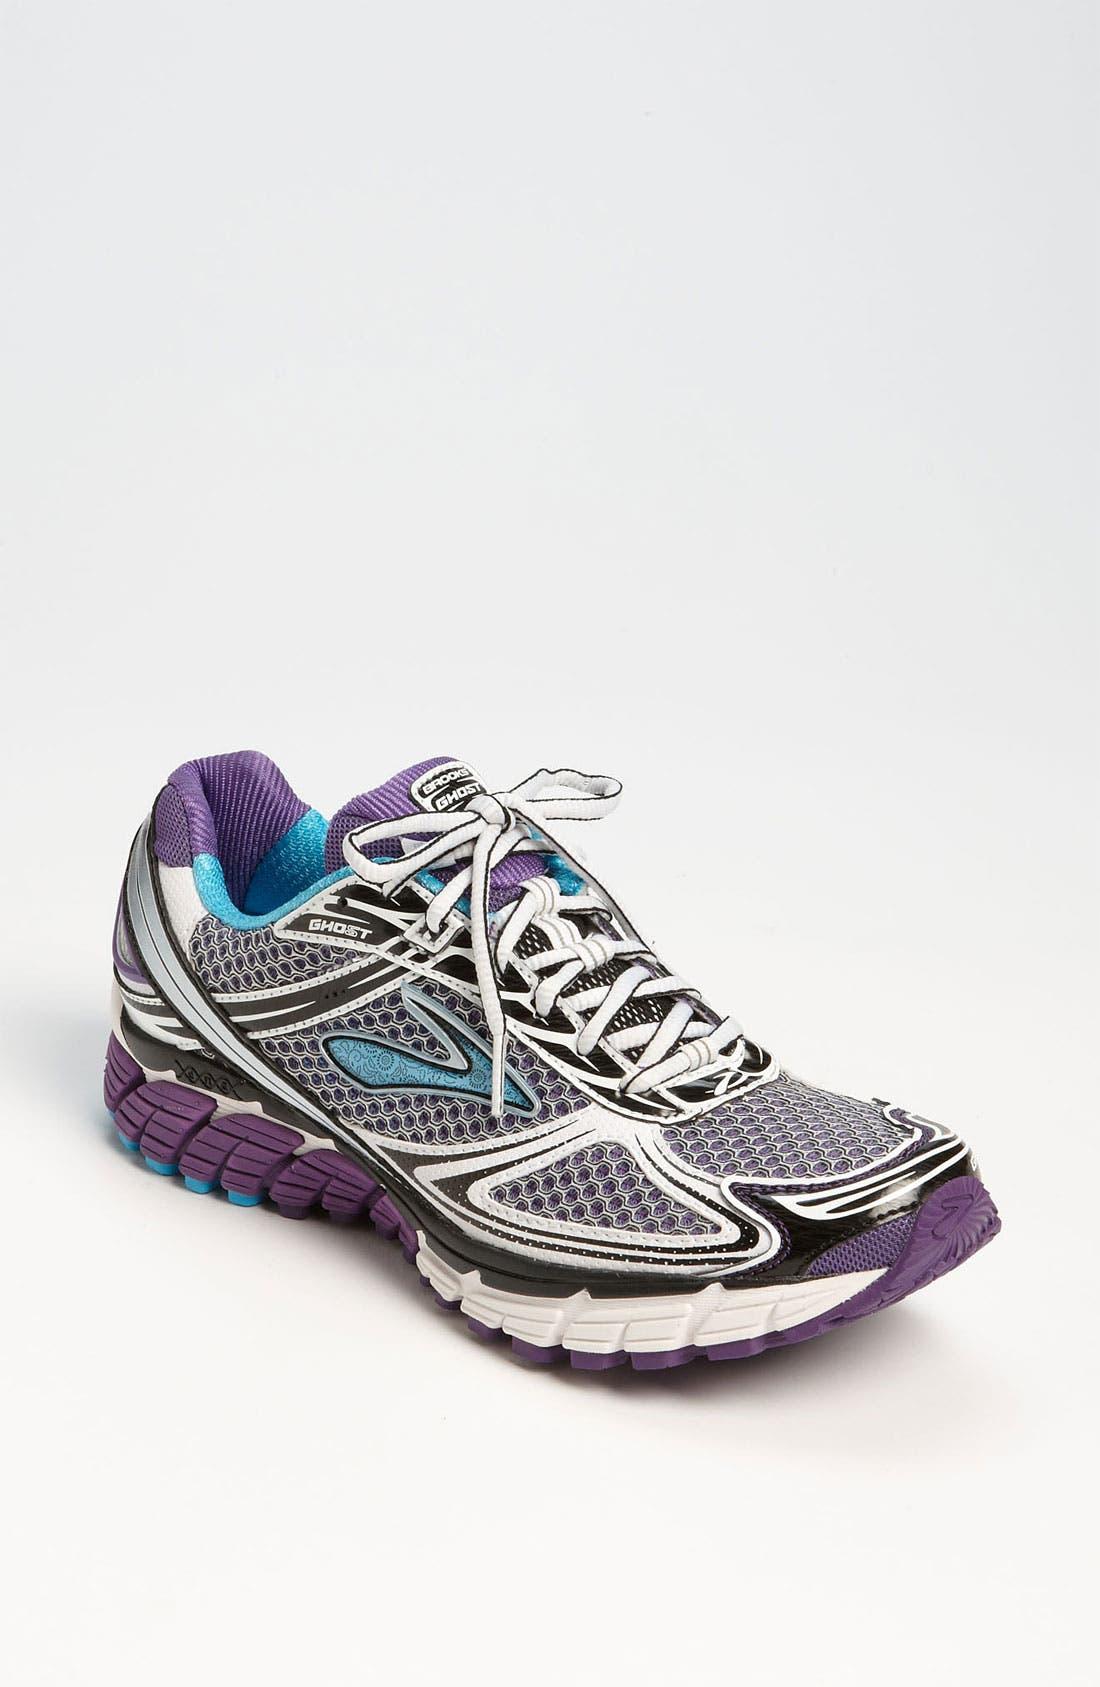 Main Image - Brooks 'Ghost 5' Running Shoe (Women) (Regular Retail Price: $109.95)